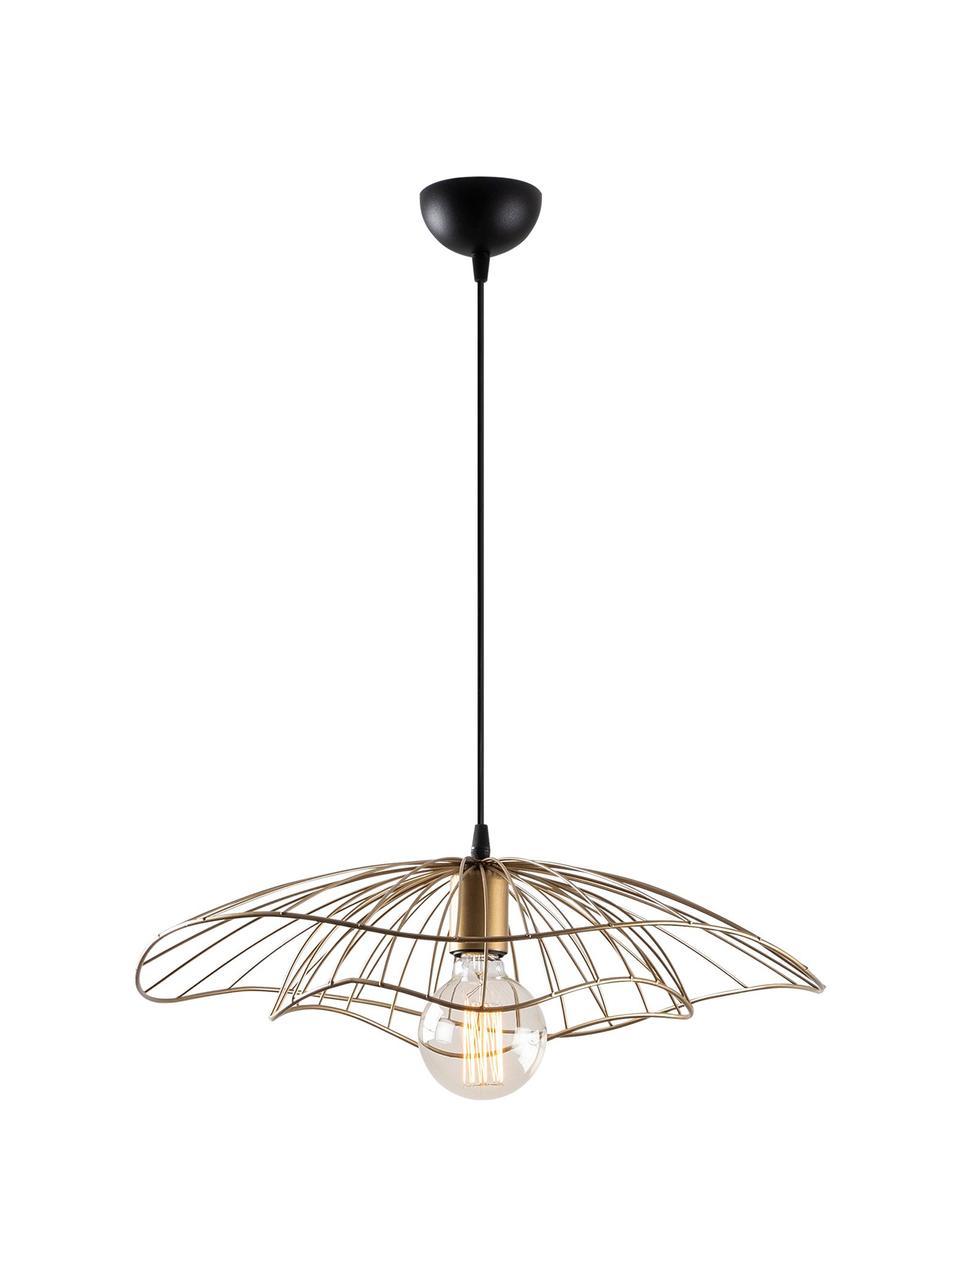 Závesná lampa z kovu Tel, Mosadzné odtiene, čierna